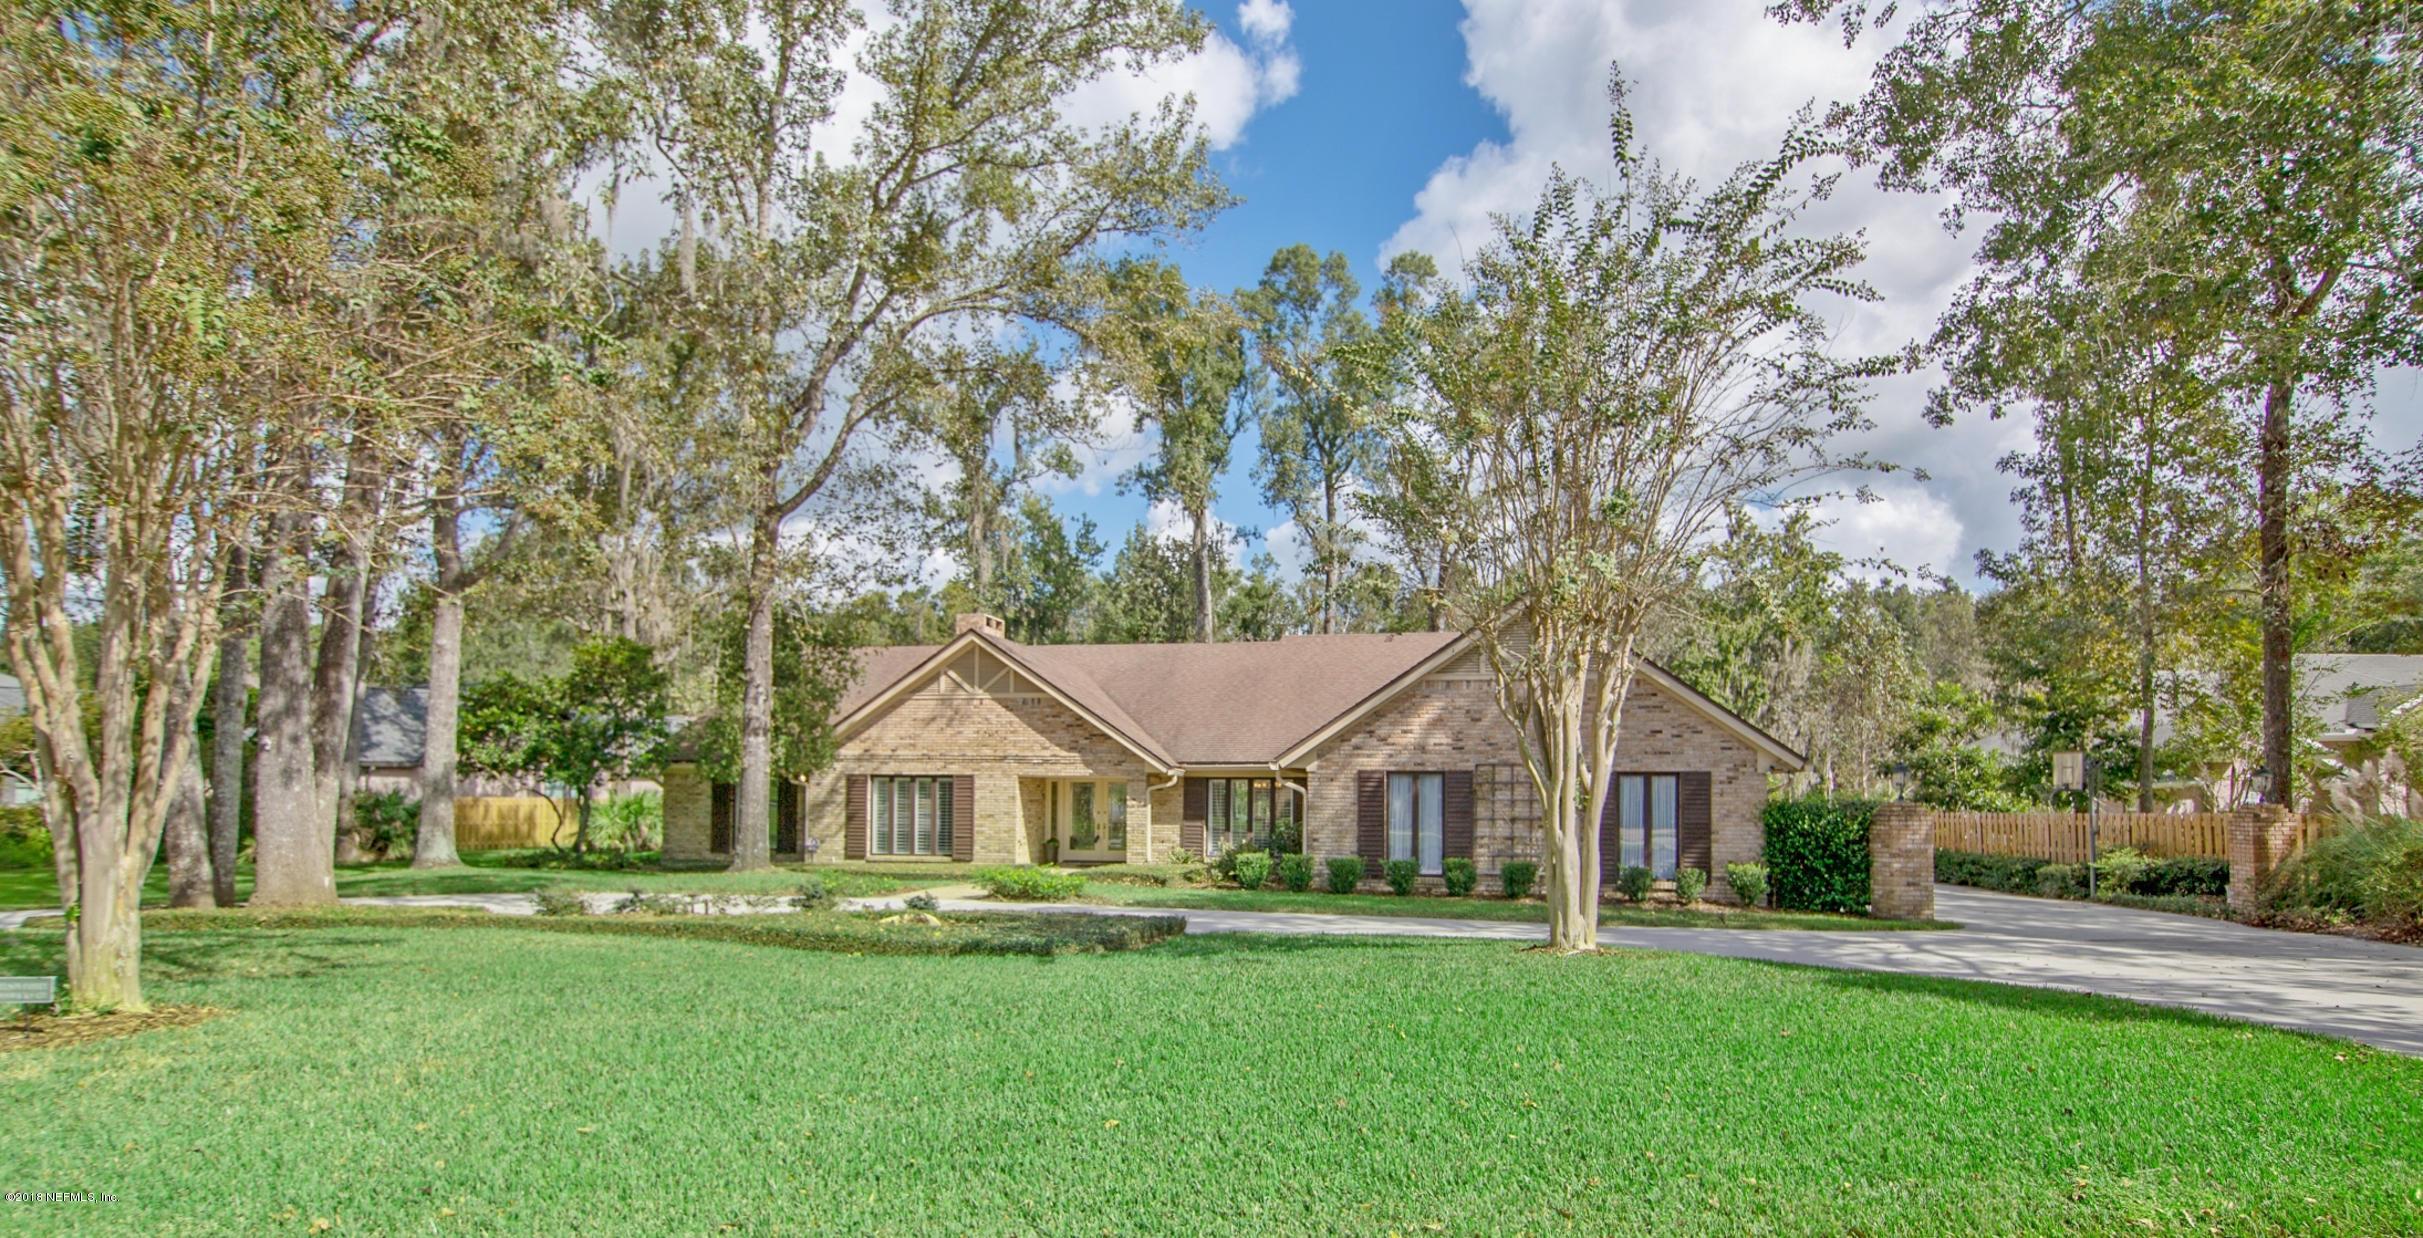 10917 CROSSWICKS, JACKSONVILLE, FLORIDA 32256, 5 Bedrooms Bedrooms, ,5 BathroomsBathrooms,Residential - single family,For sale,CROSSWICKS,962639